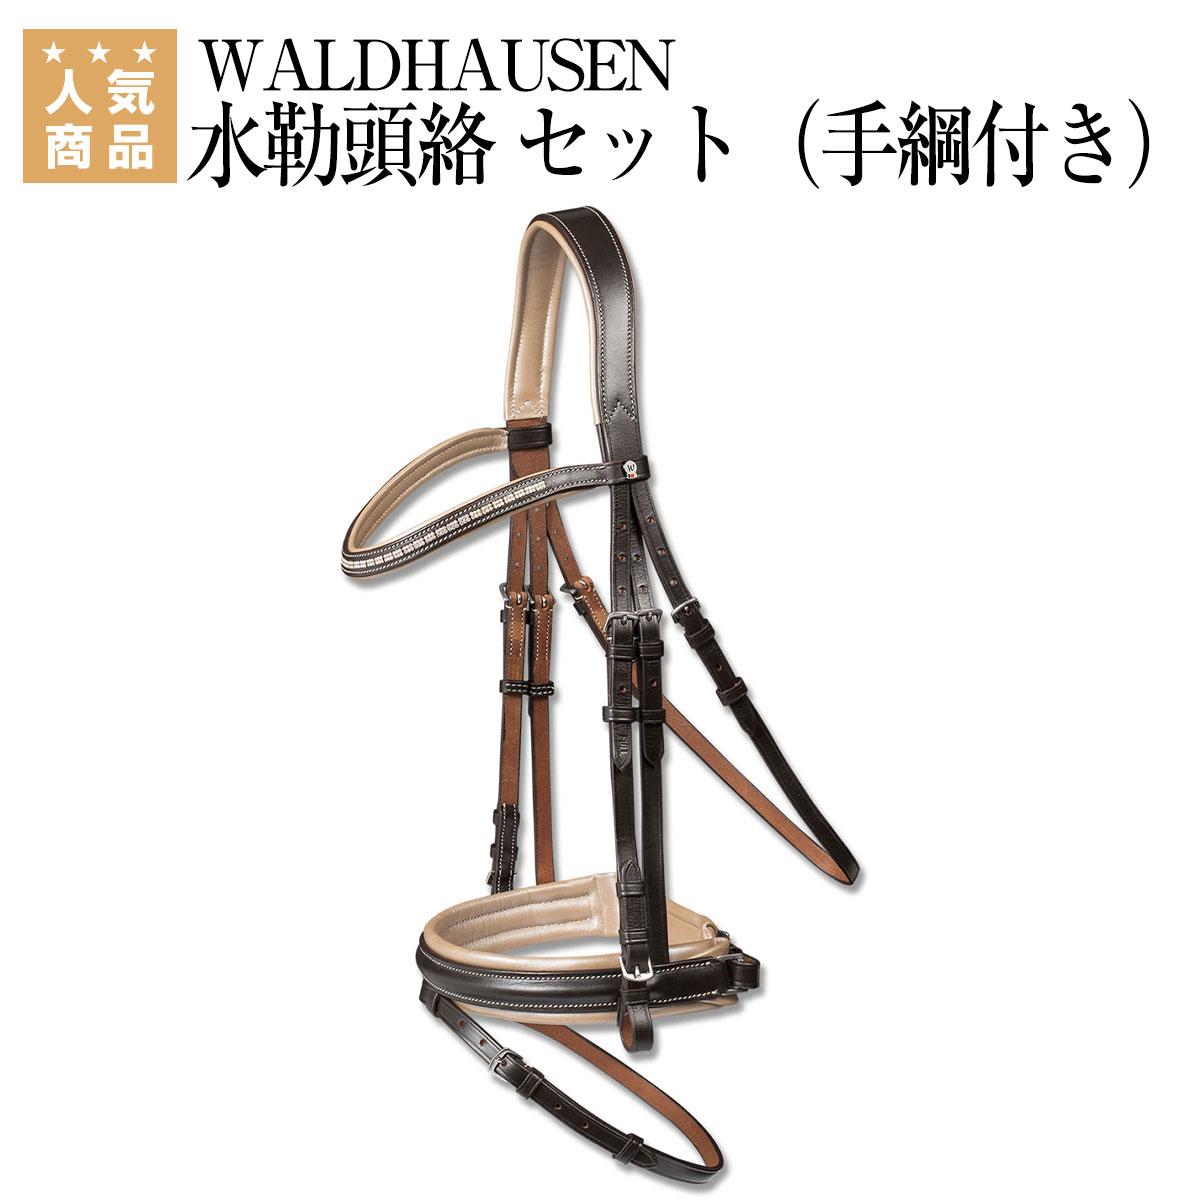 乗馬 頭絡 付属品 額革 送料無料 WALDHAUSEN -BROWN BEIGE- 水勒頭絡 セット(手綱付き) 乗馬用品 馬具